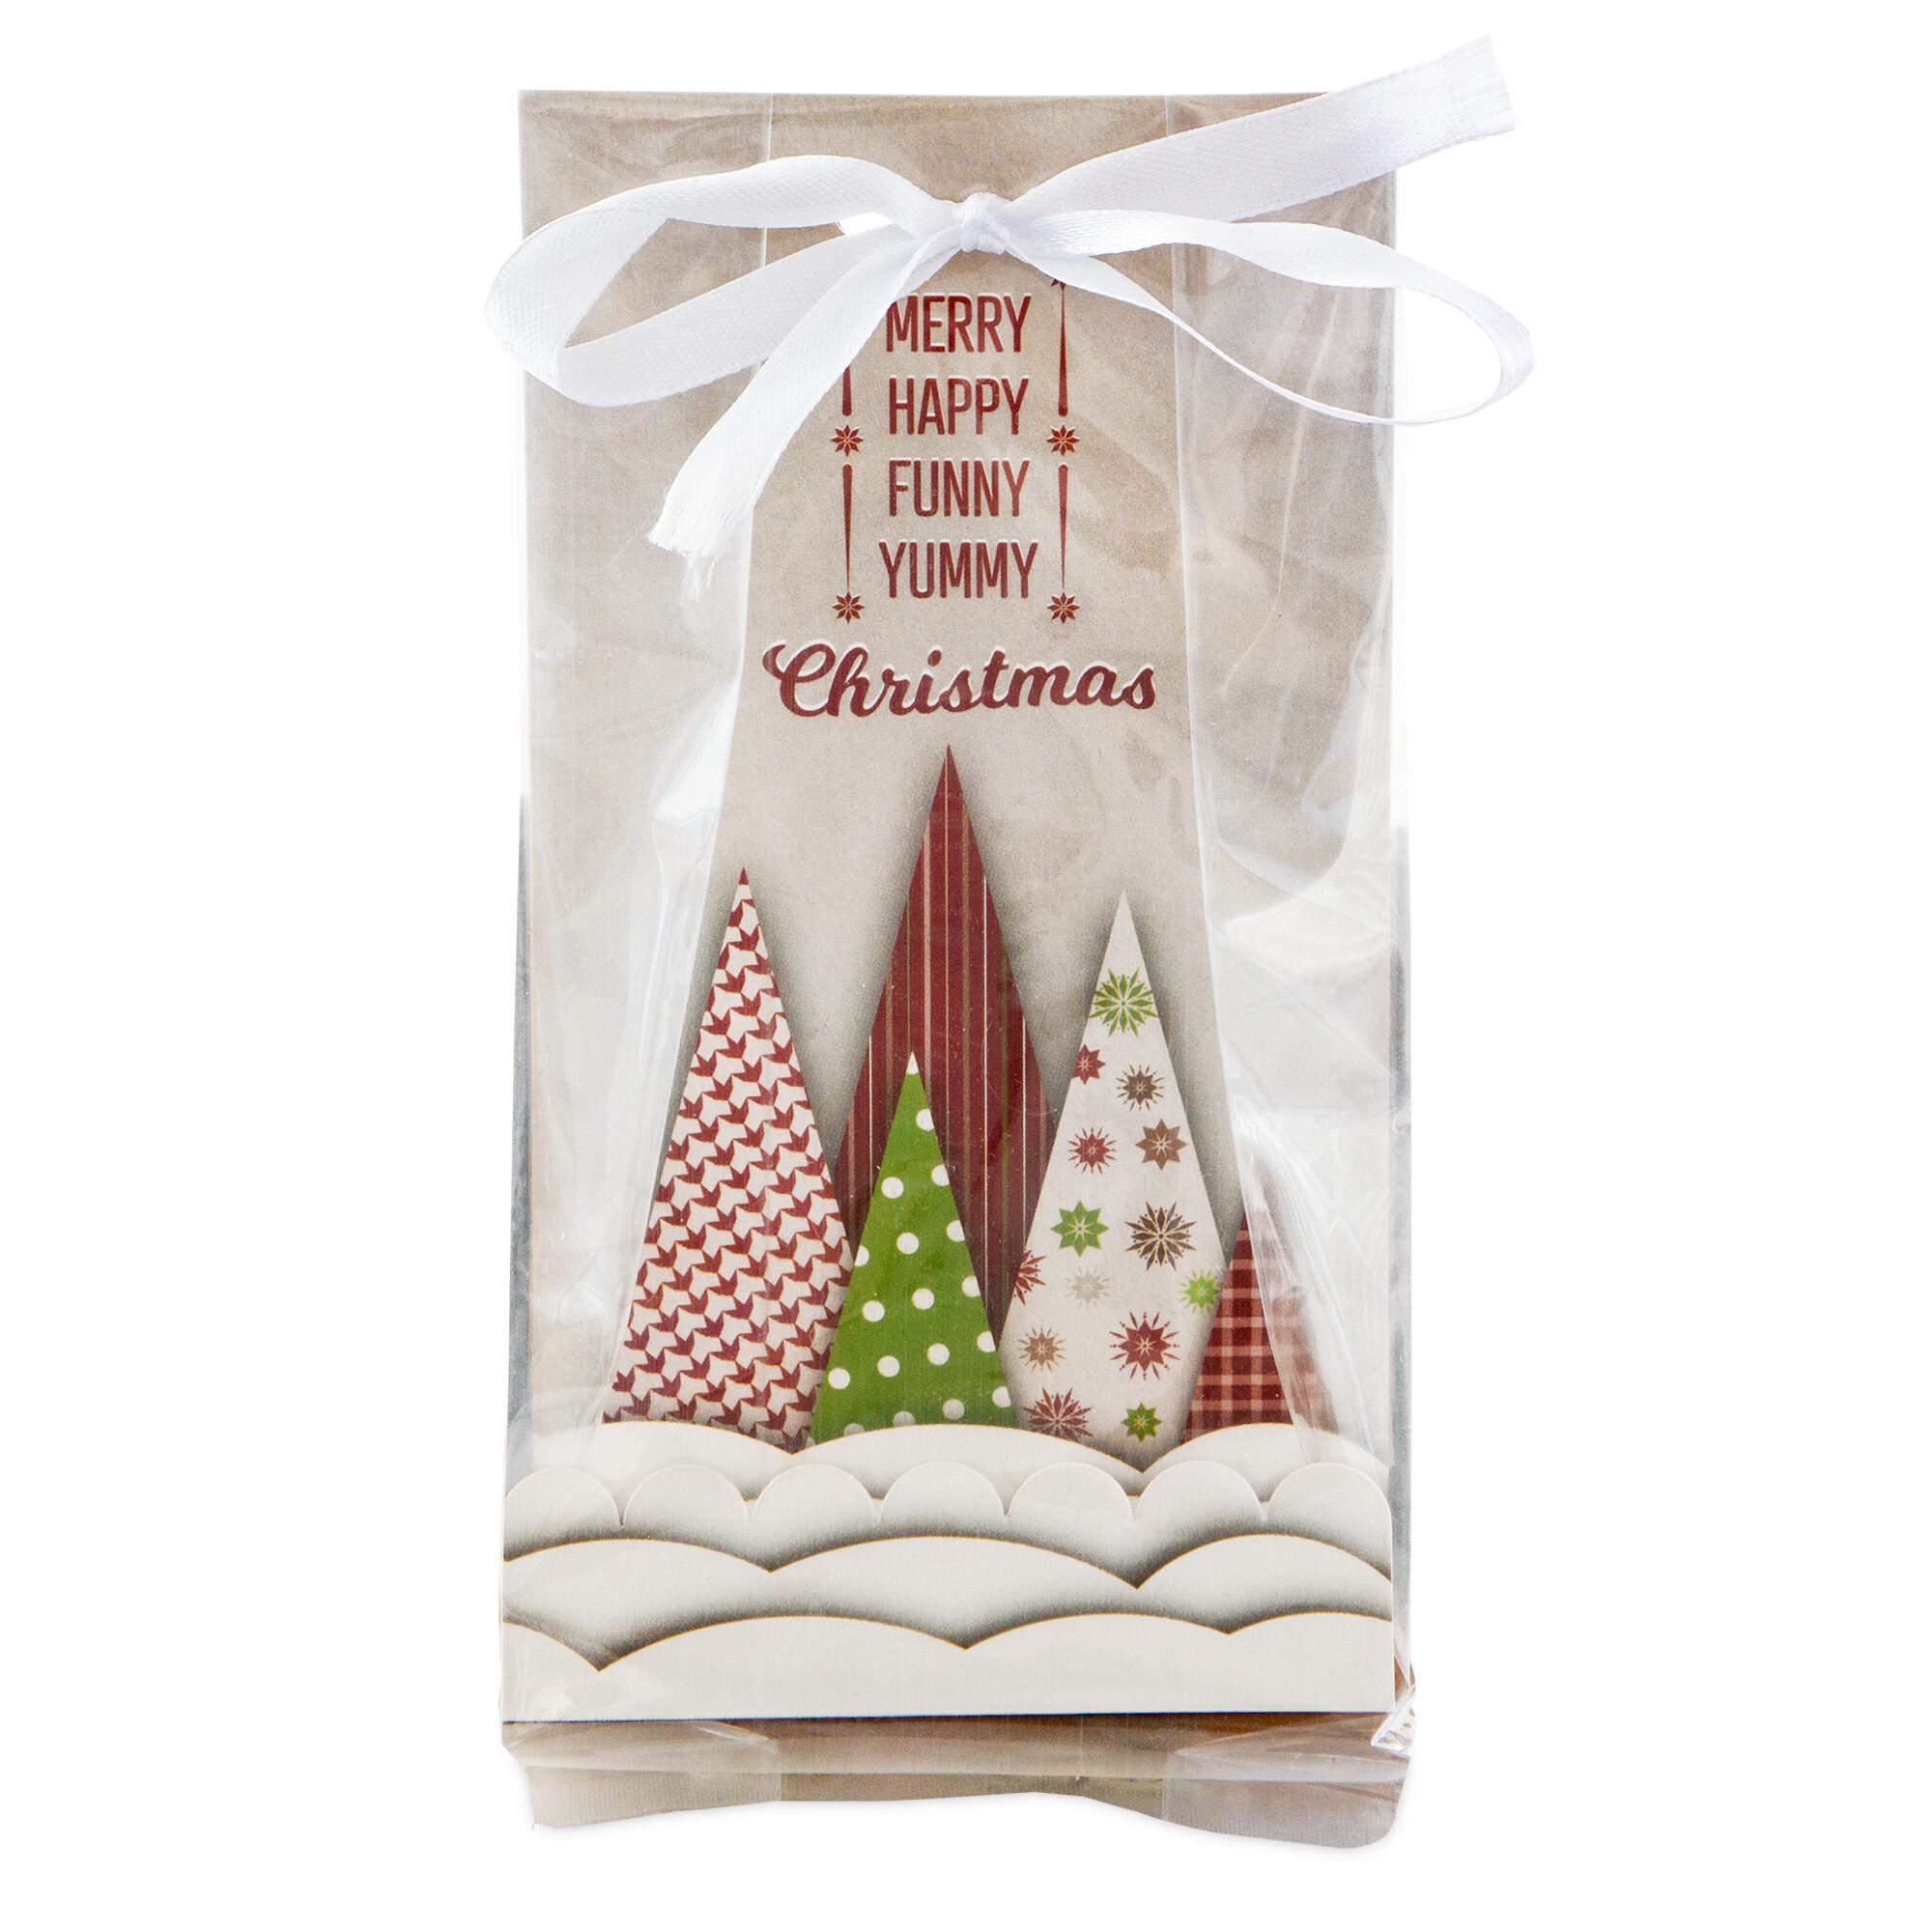 Geschenktüten - Yummy Christmas - Set, 24-teilig